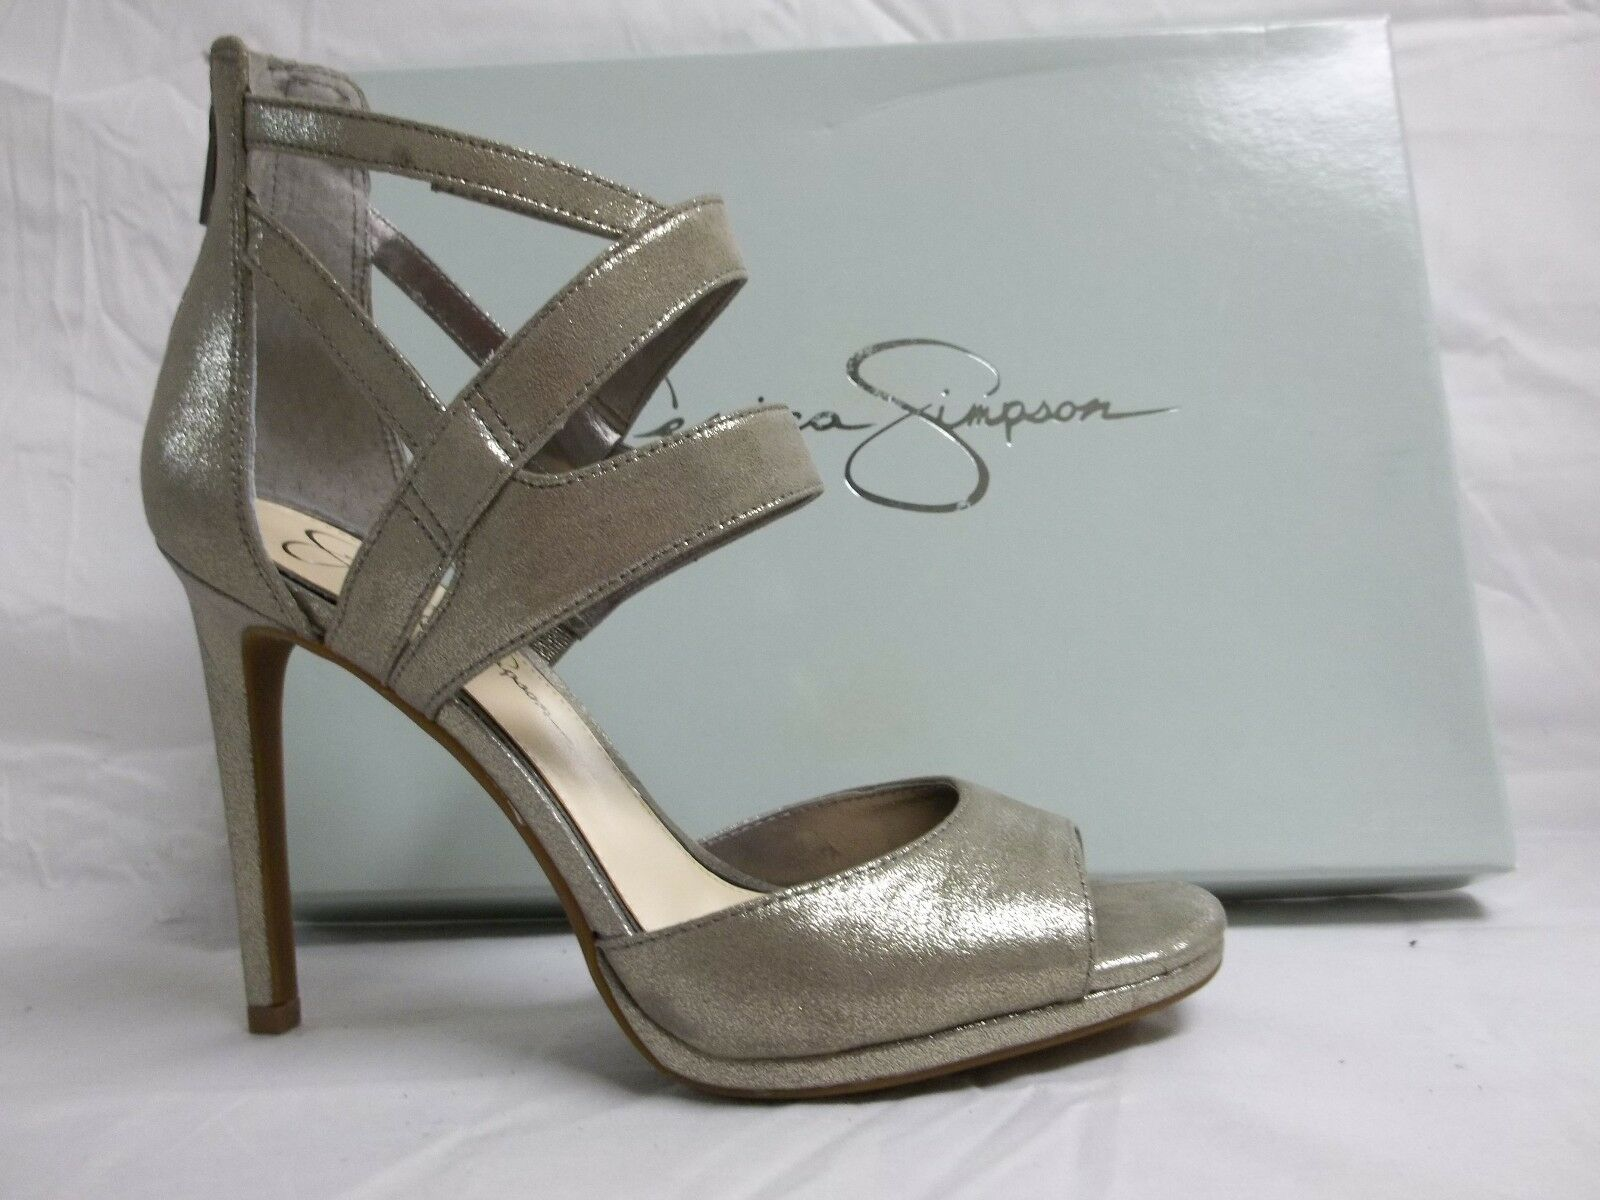 Jessica Simpson Size 8 M Mariani Slate Open Toe Heels New Womens shoes